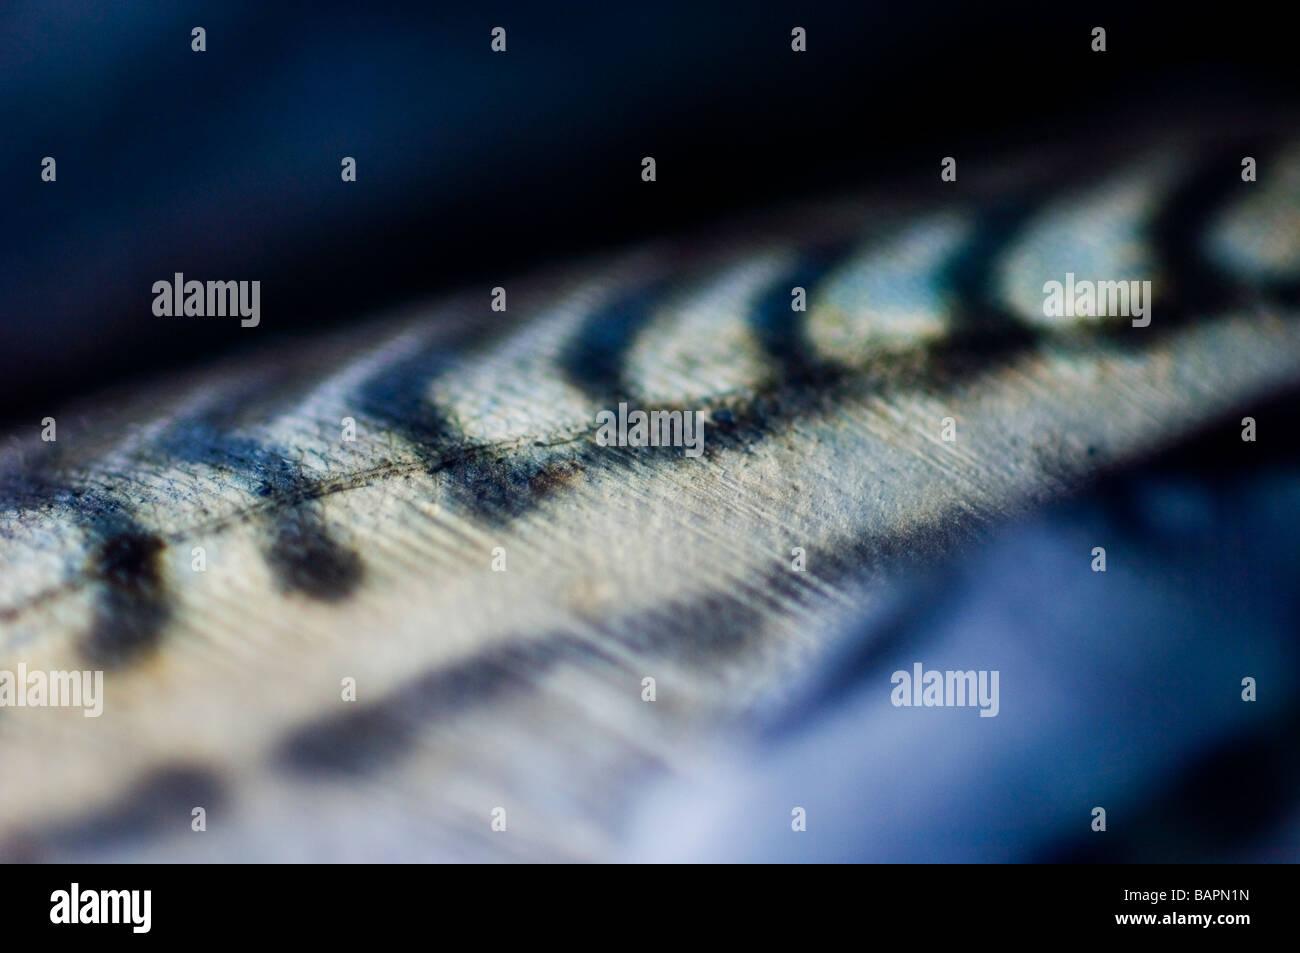 Scomber scombrus. Caballa escalas, close-up, UK Imagen De Stock